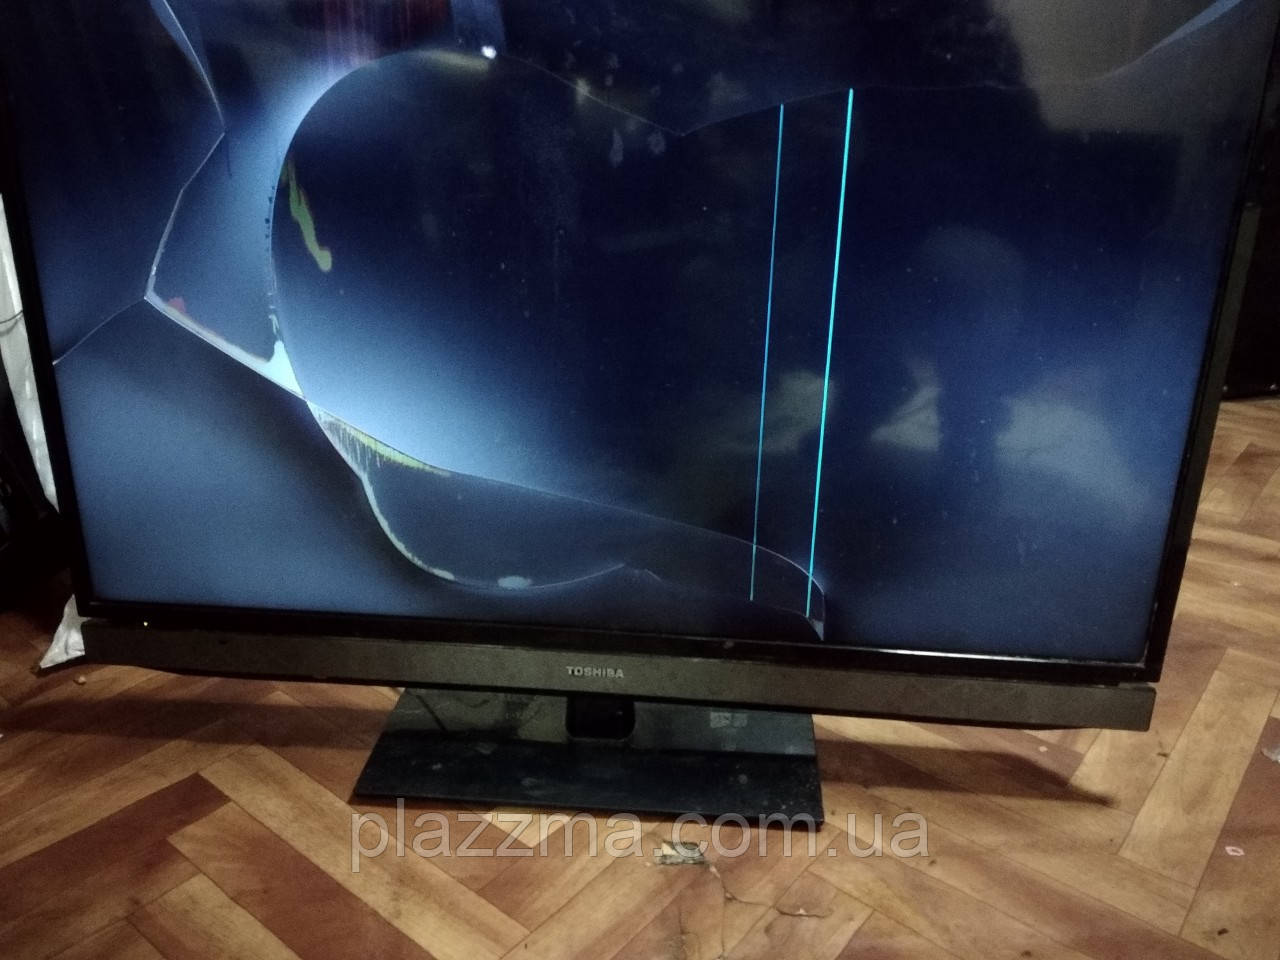 Телевизор Toshiba 40PB200V1 на запчасти или восстановление